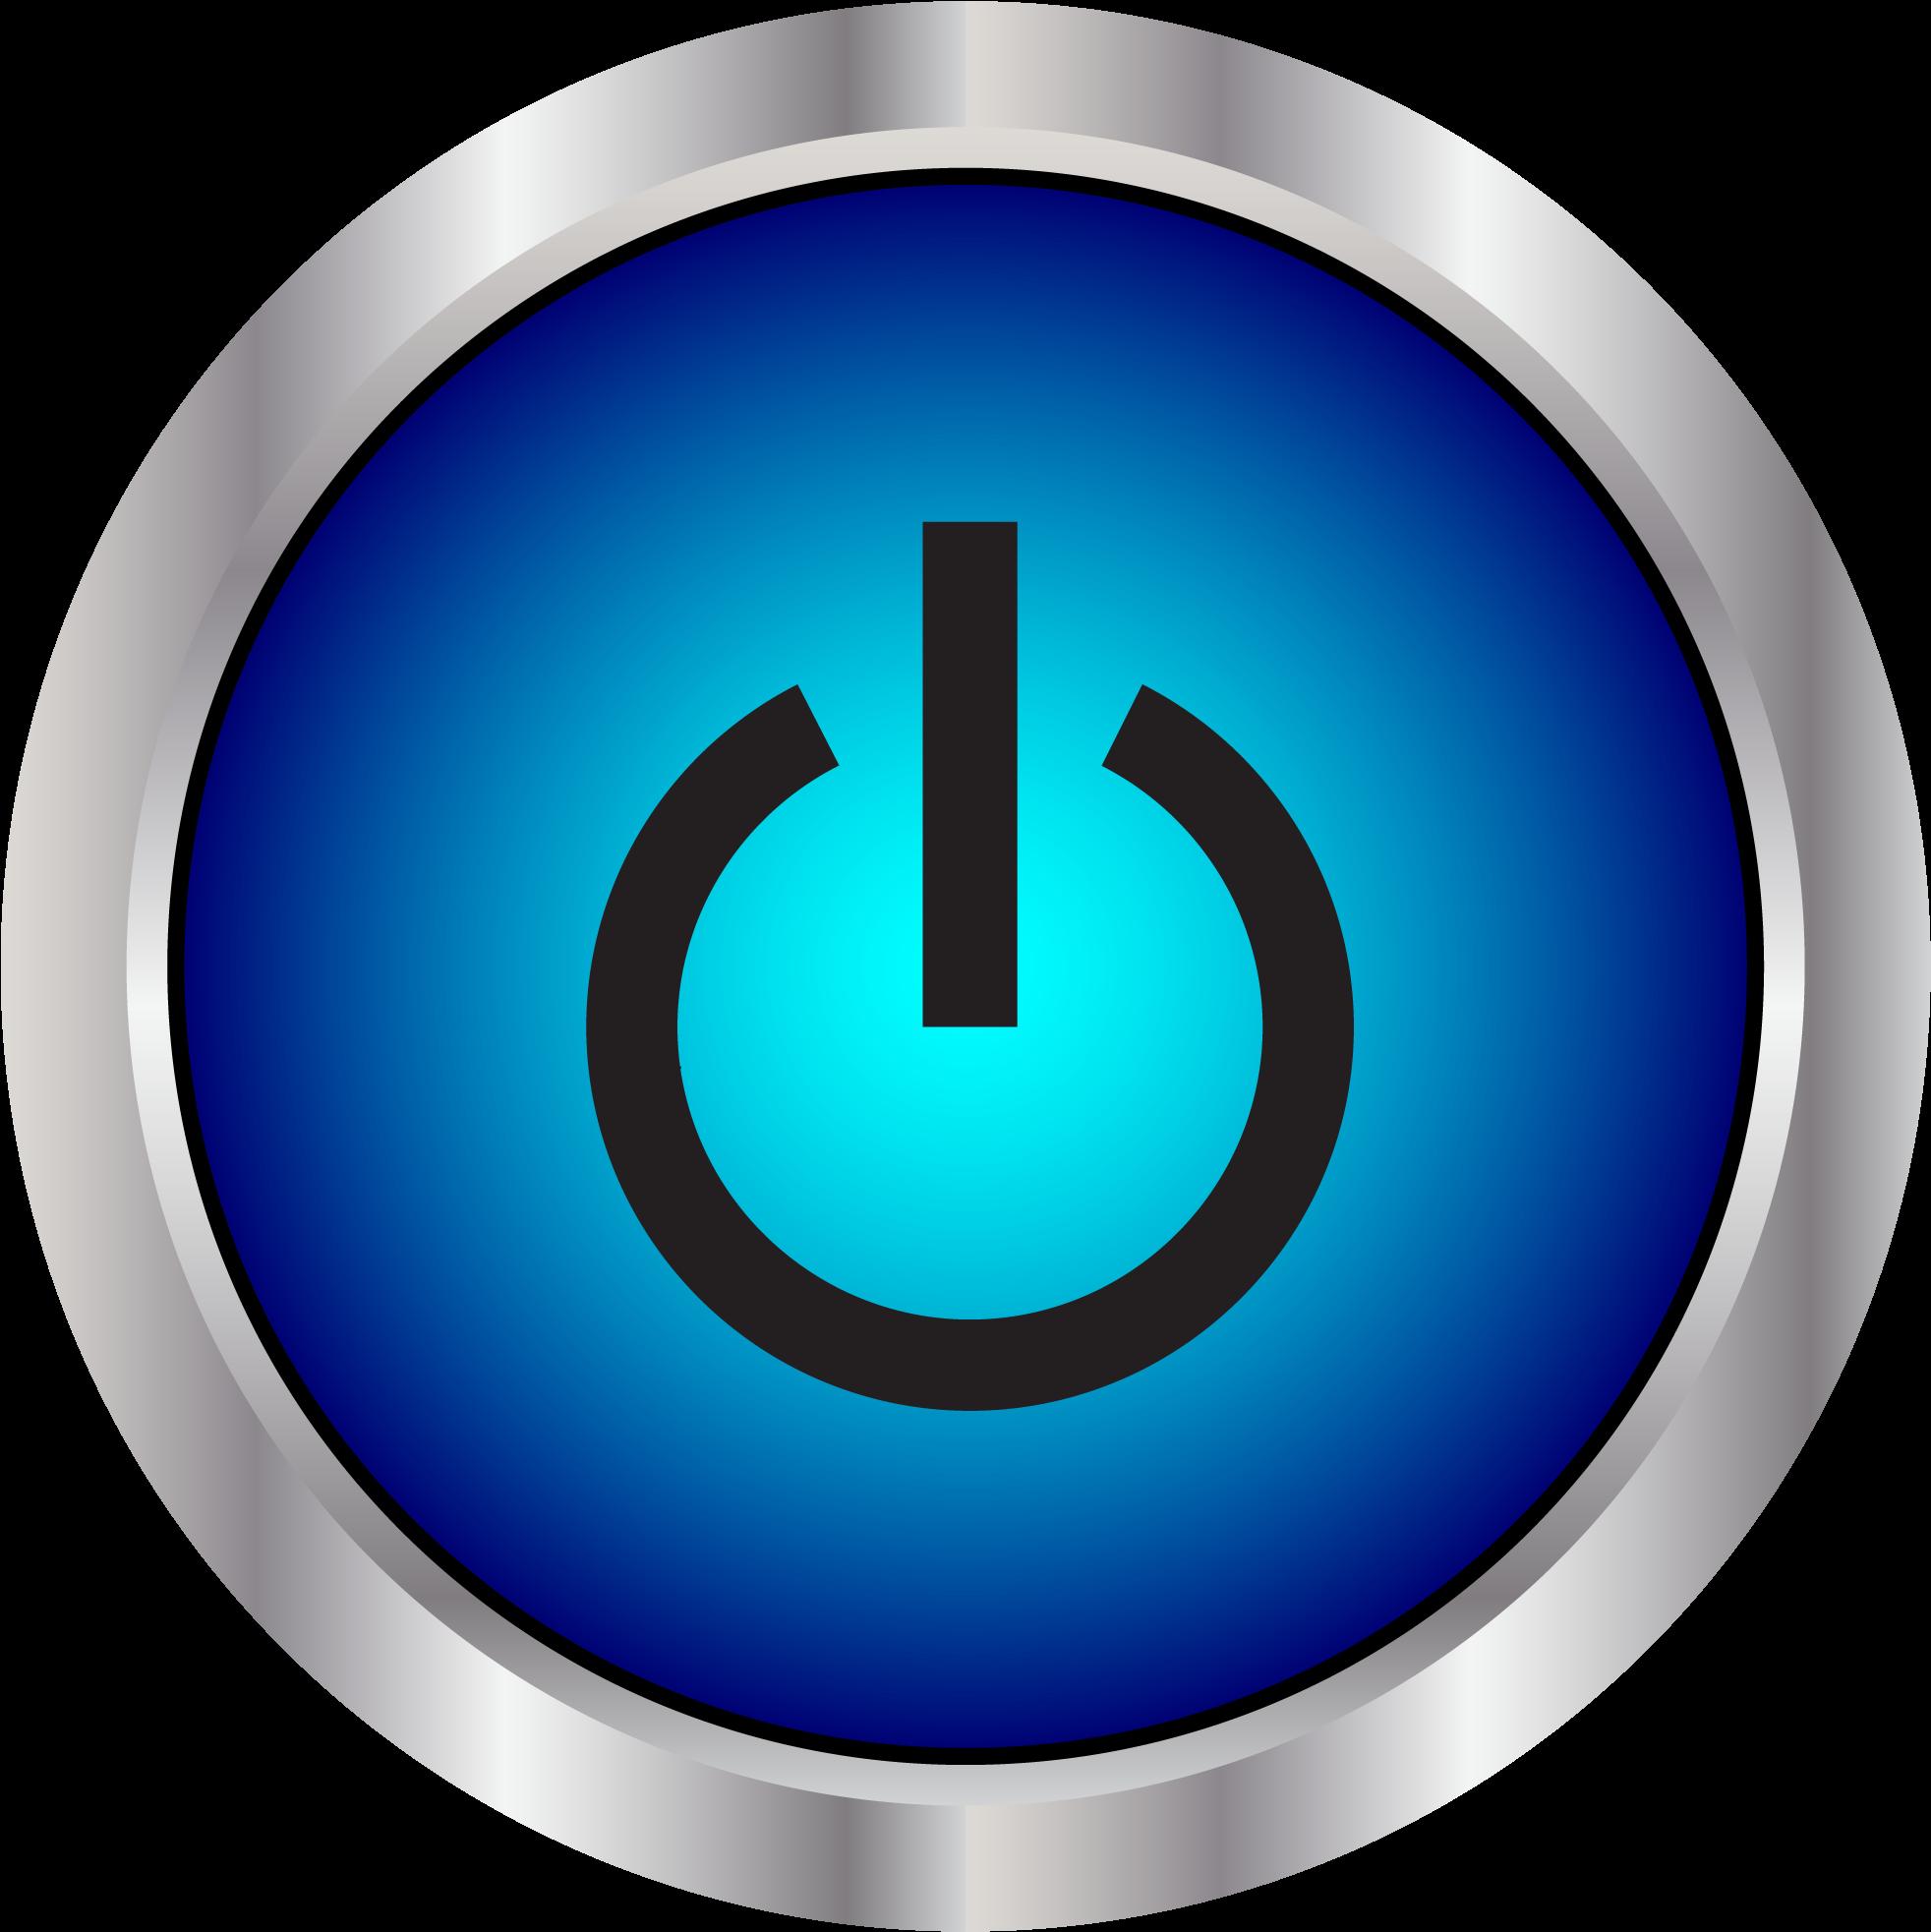 Big Image Blue Power Button Icon.